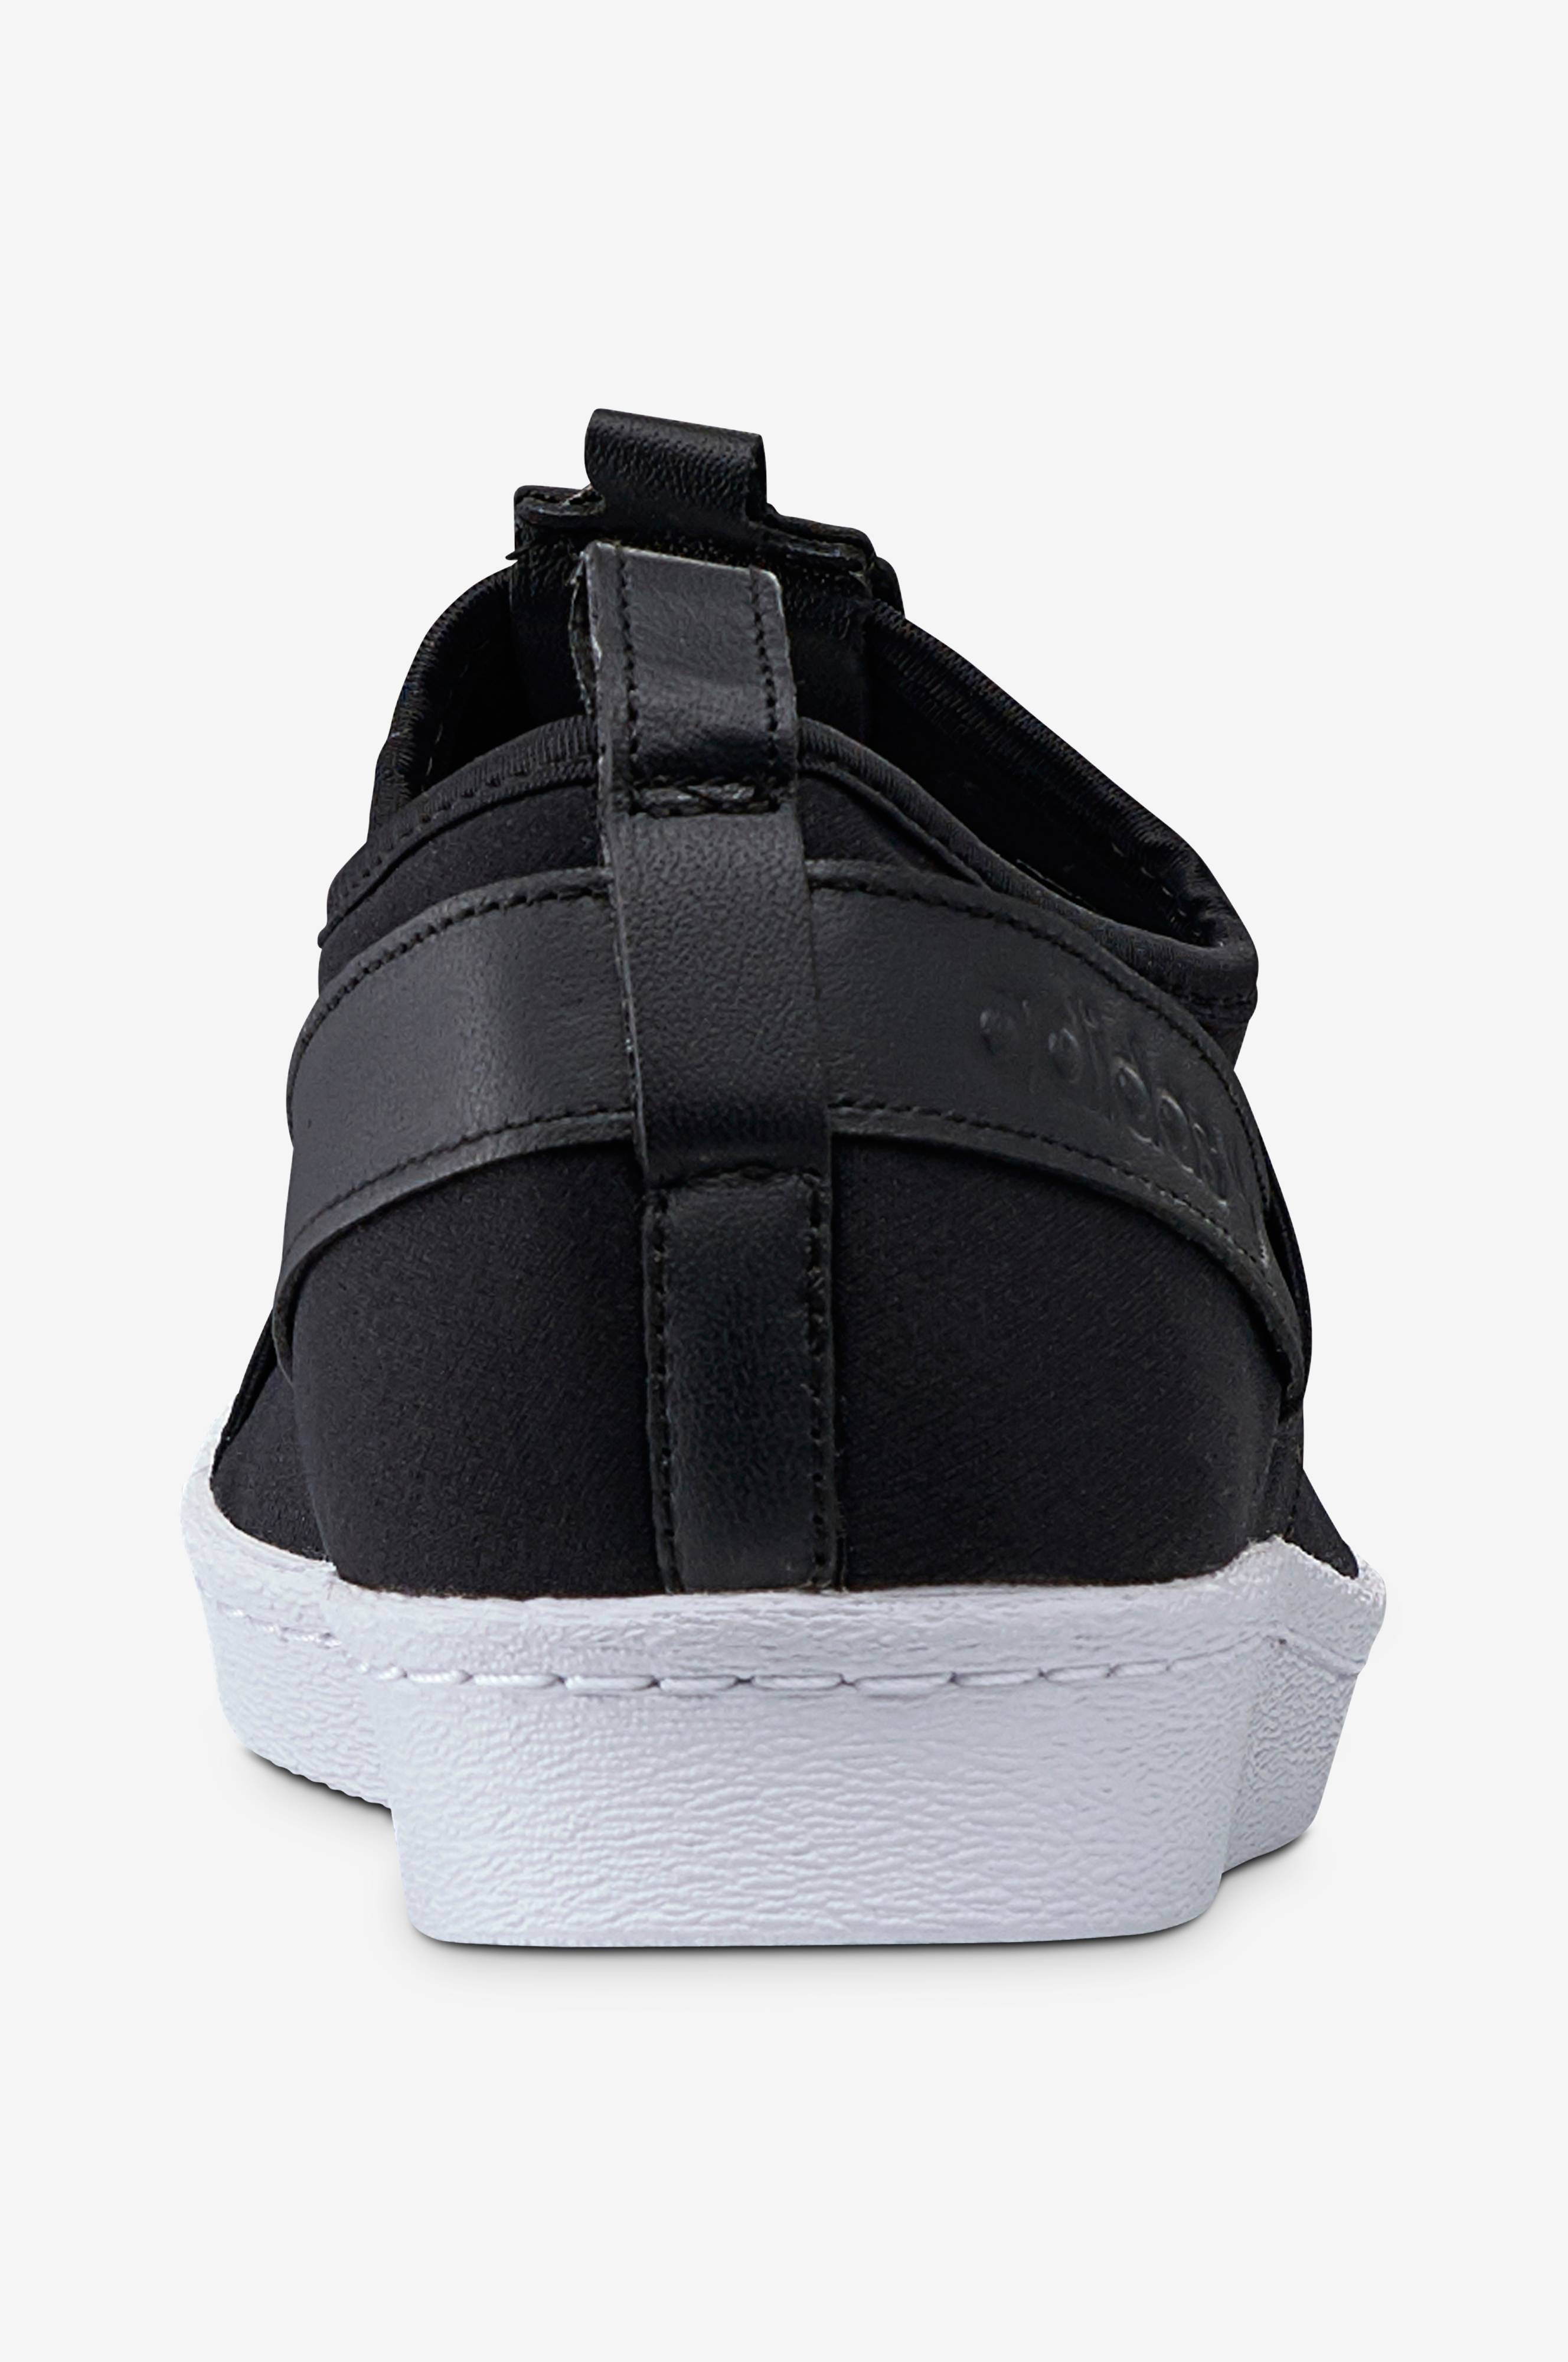 Sort Adidas Superstar Slip On Kondisko Herre